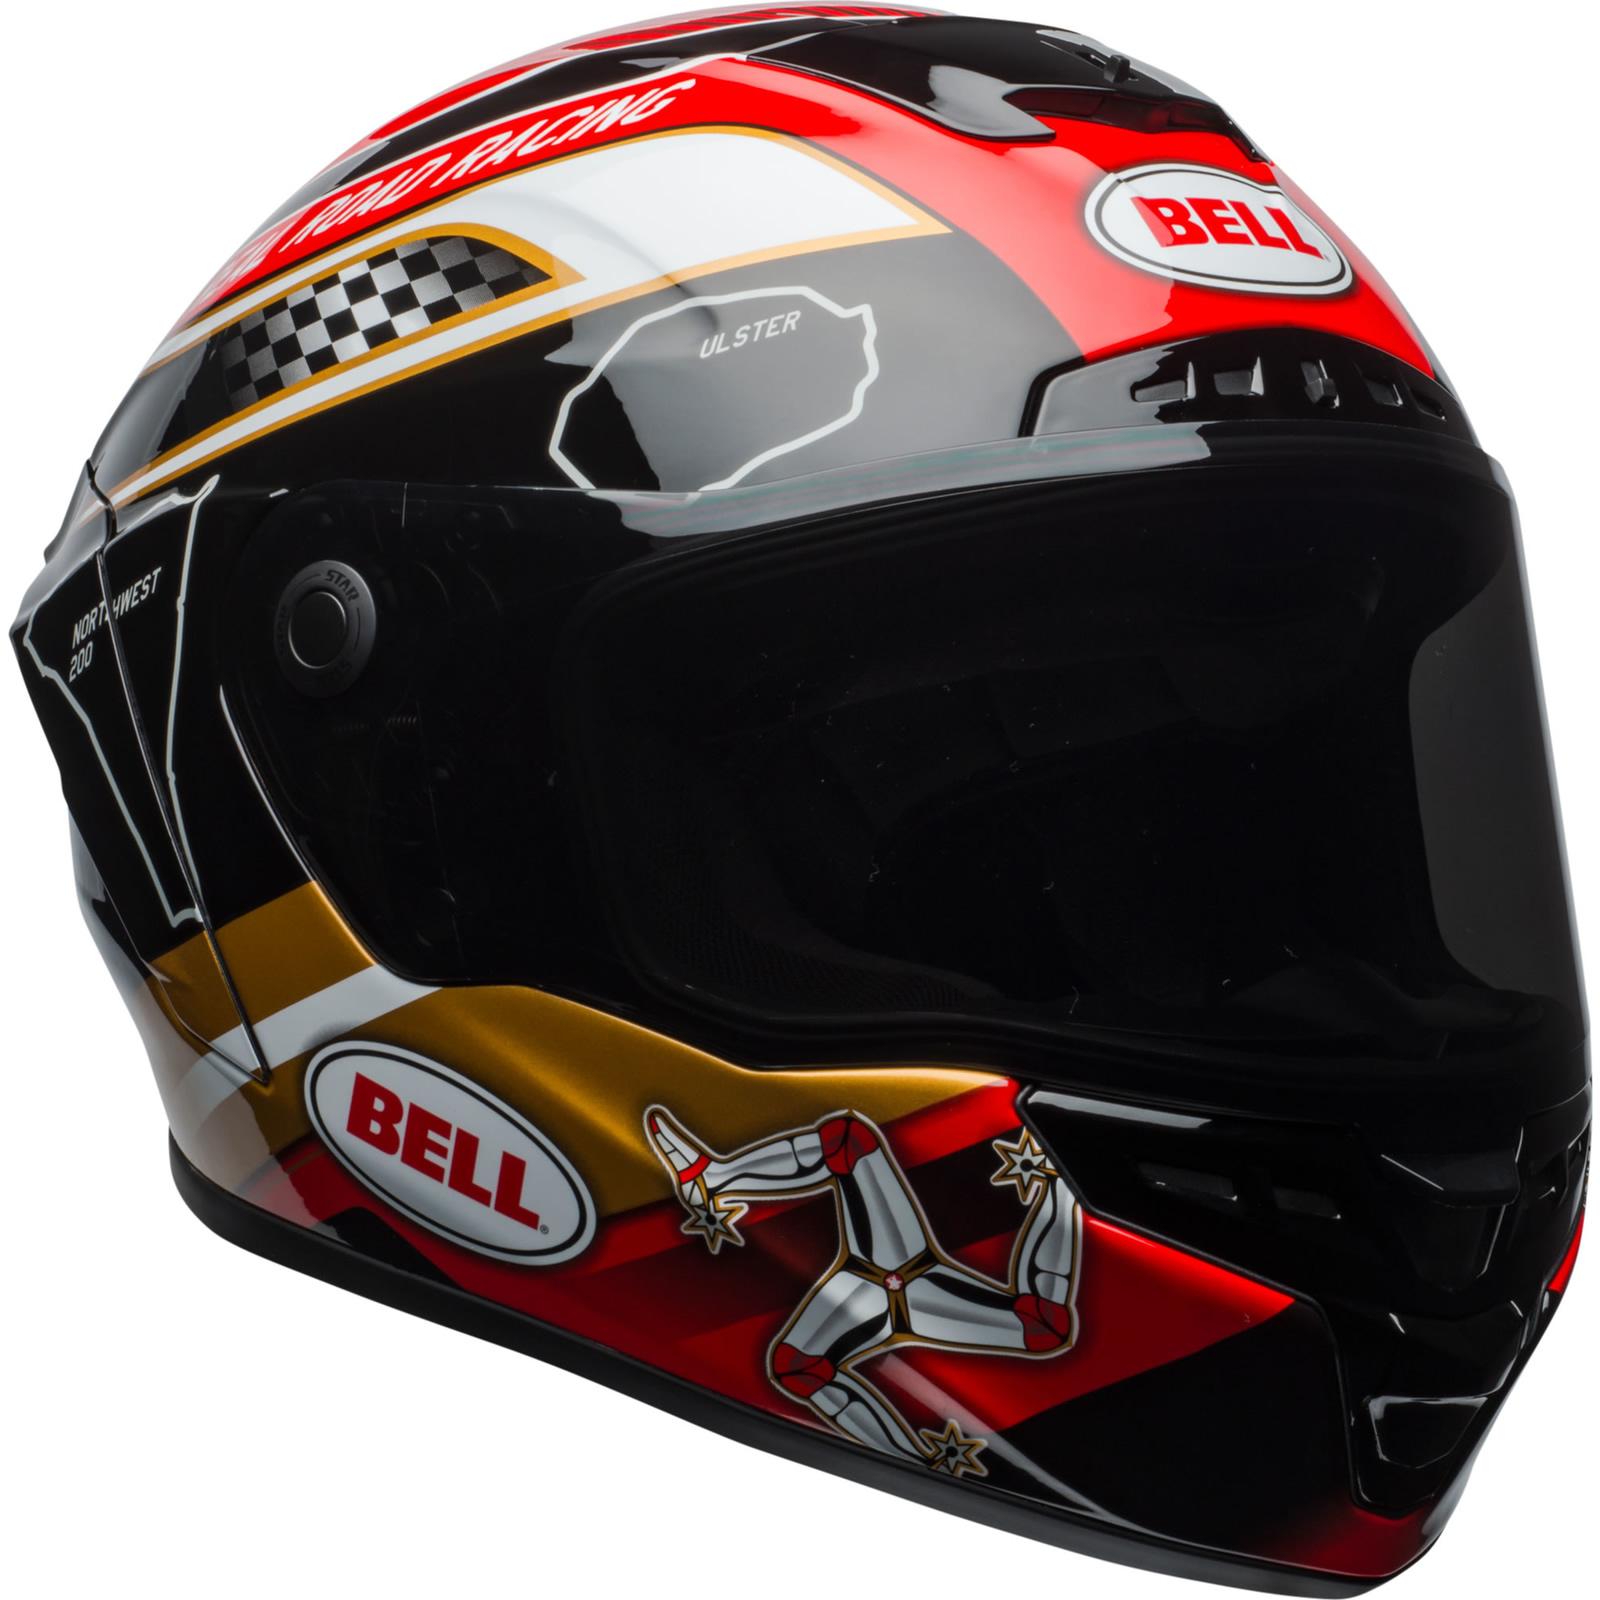 Bell Full Face Helmet >> Details About Bell Star Mips Isle Of Man Motorcycle Helmet Visor Full Face Racing Motorbike